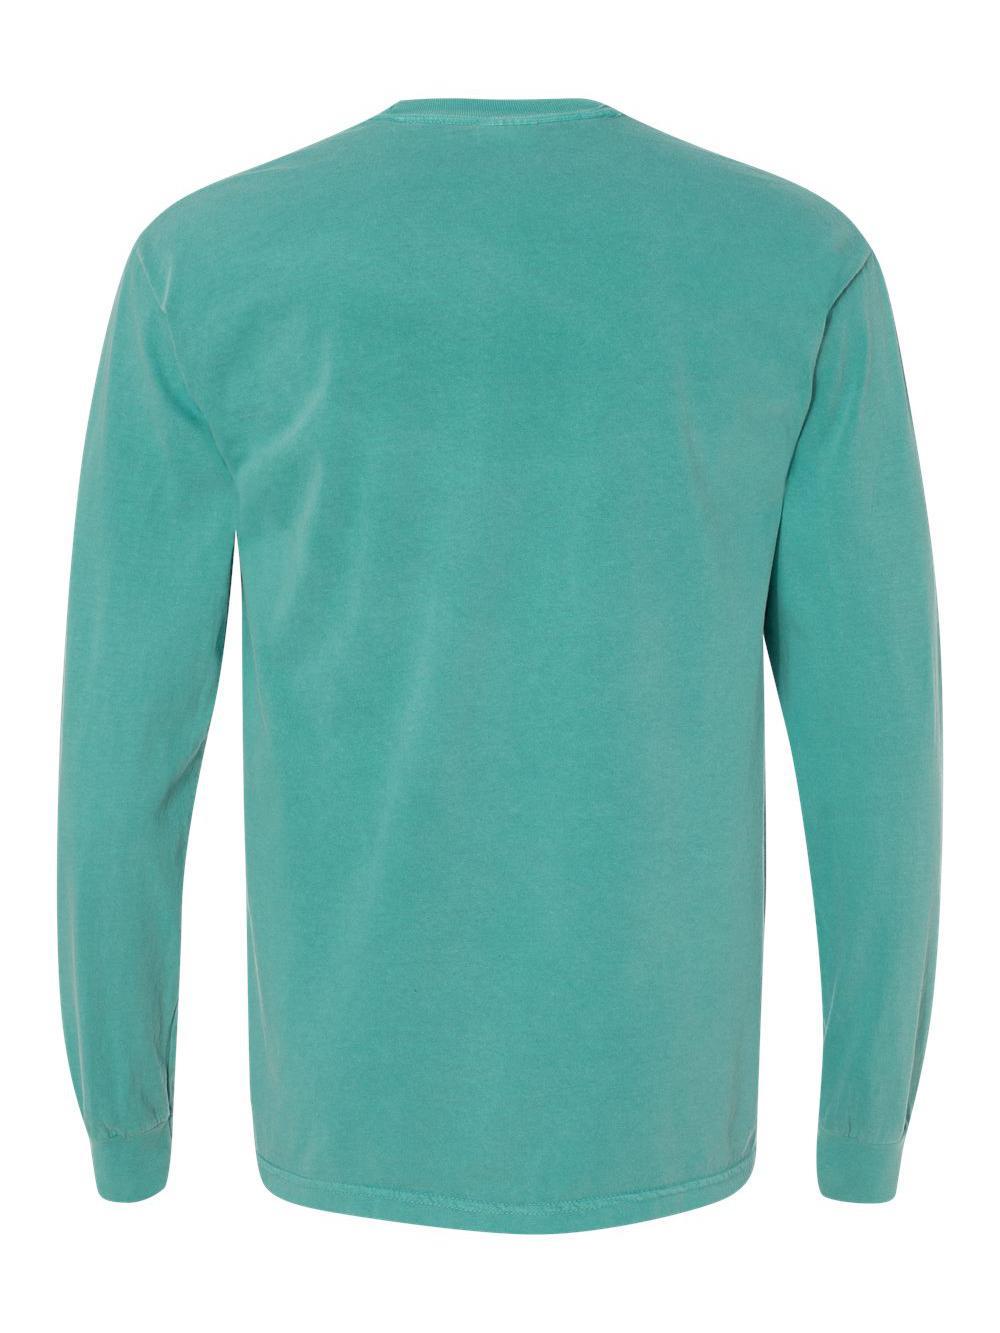 Comfort-Colors-Garment-Dyed-Heavyweight-Ringspun-Long-Sleeve-T-Shirt-6014 thumbnail 61